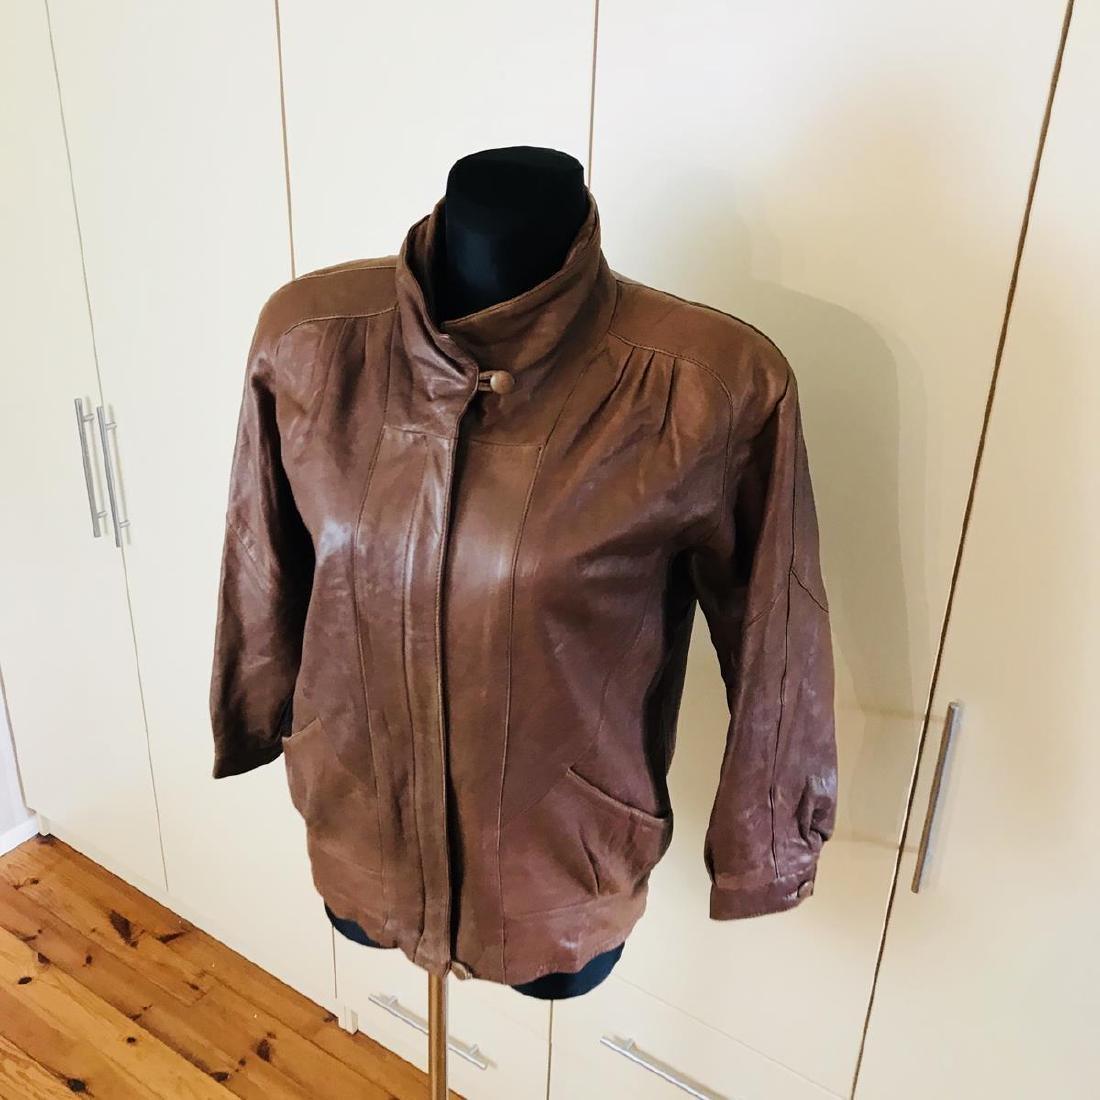 Vintage Women's Leather Jacket Coat - 3